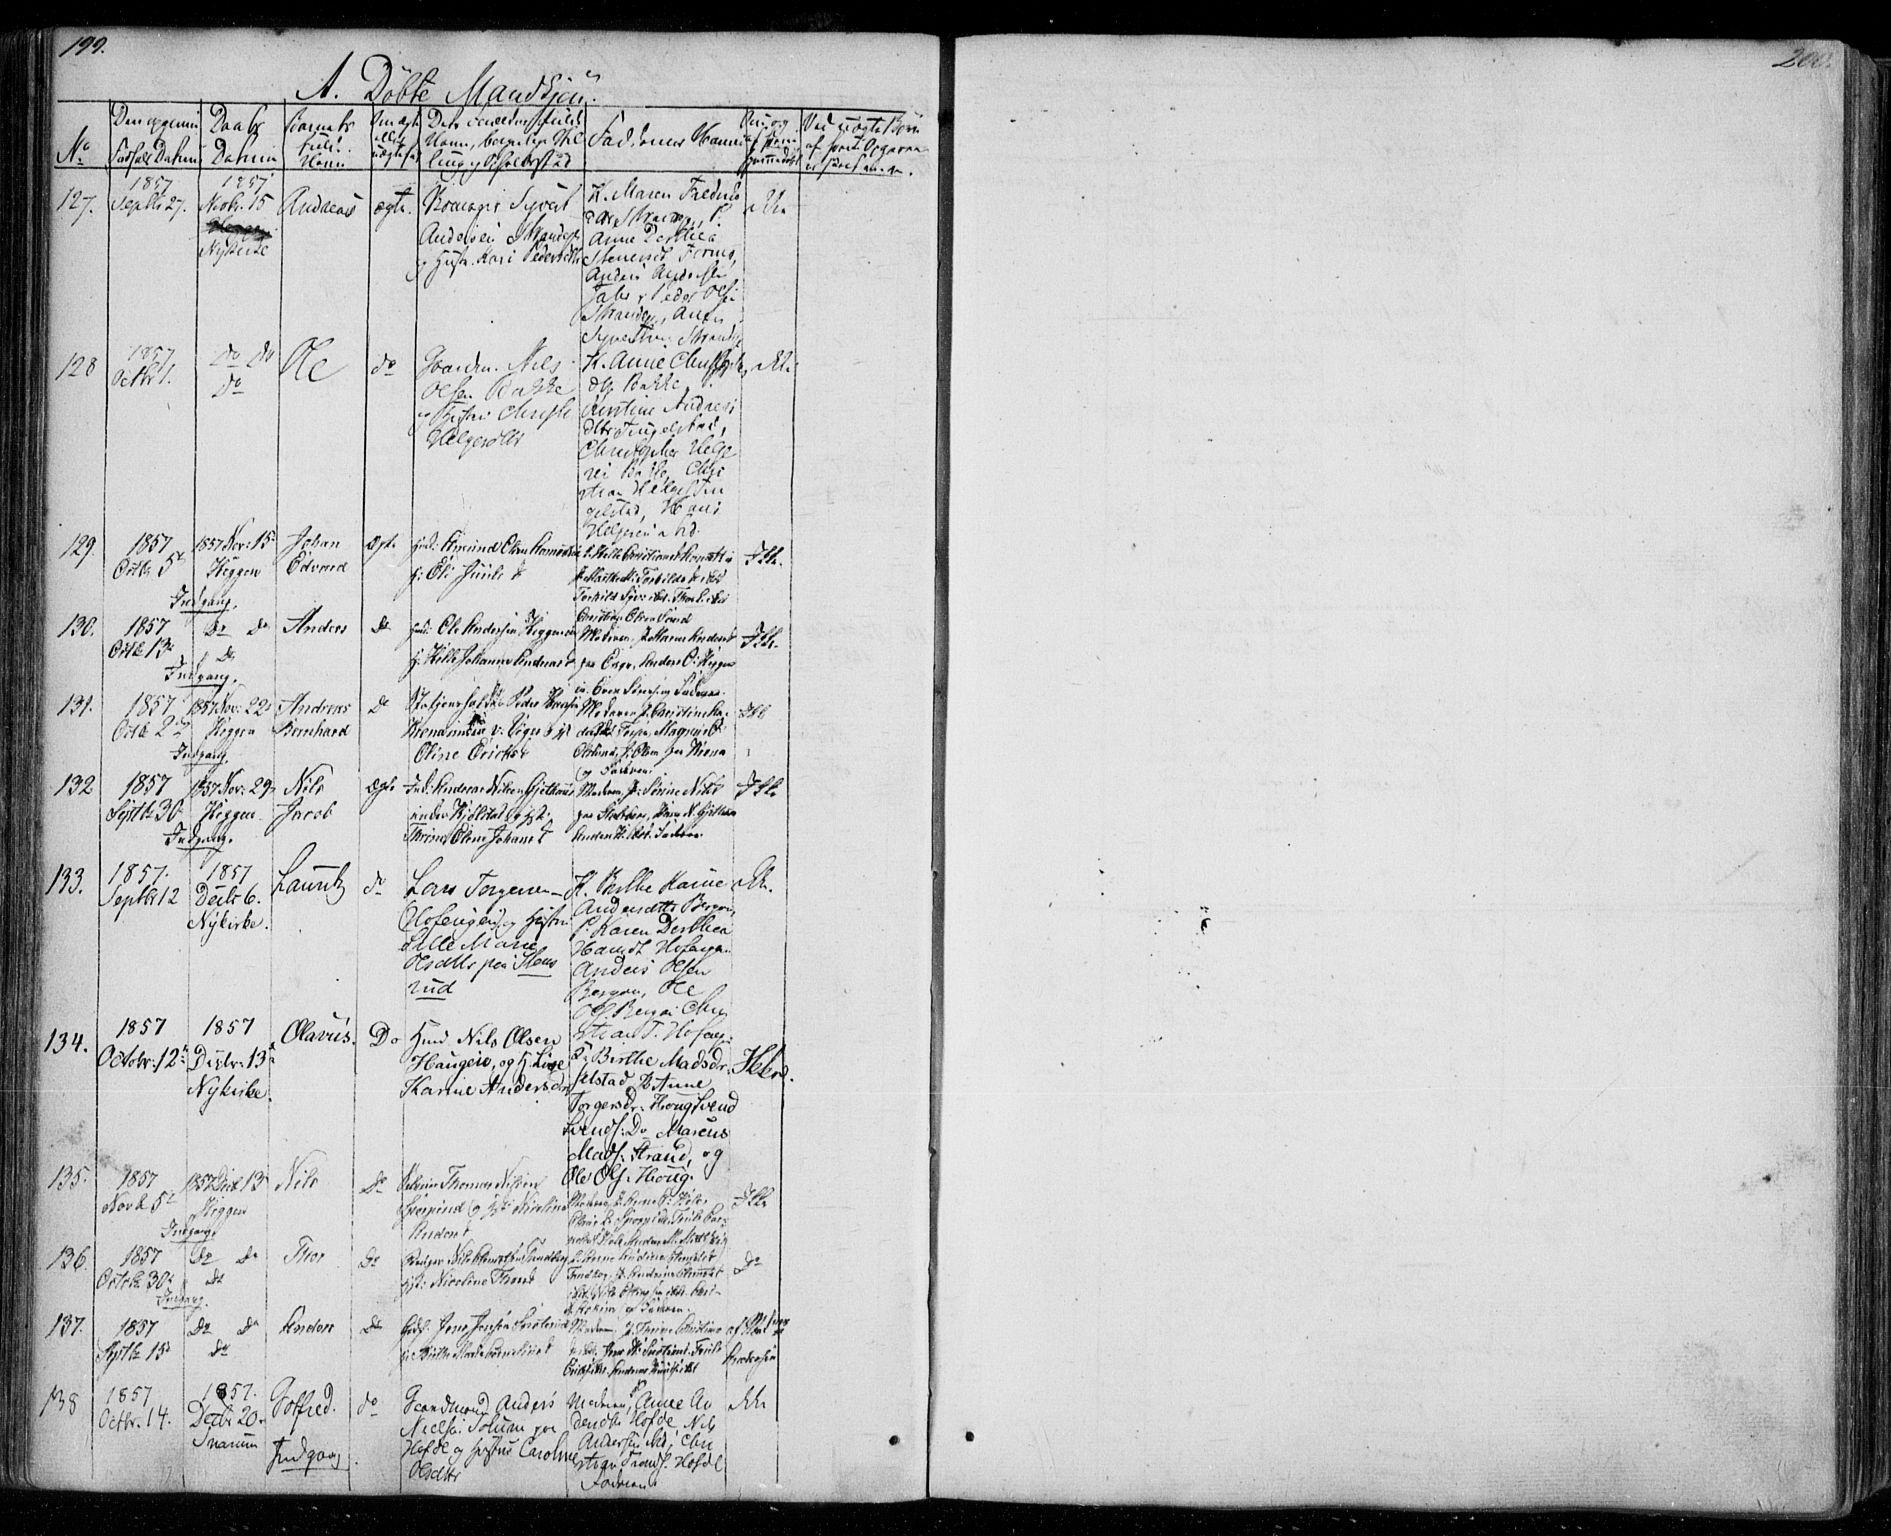 SAKO, Modum kirkebøker, F/Fa/L0008: Ministerialbok nr. 8, 1851-1859, s. 199-200